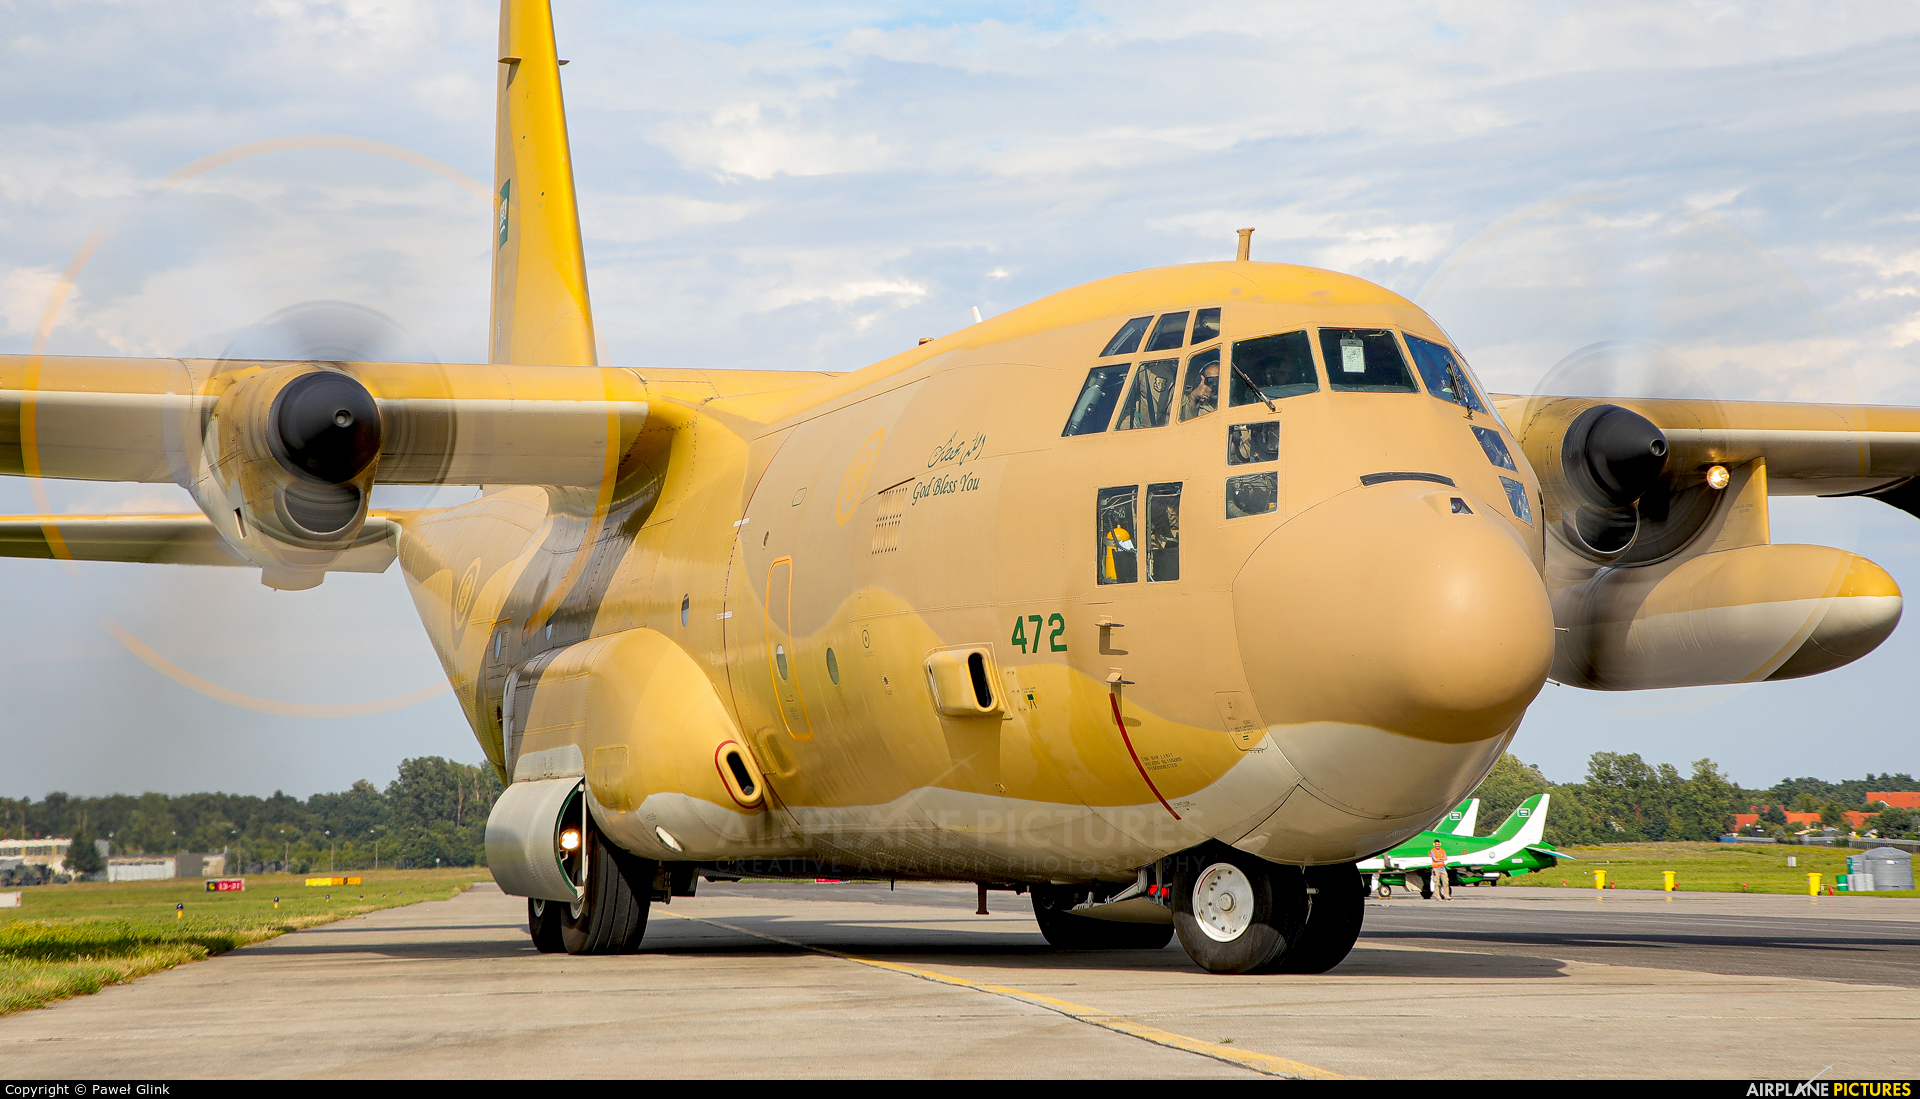 Saudi Arabia - Air Force 472 aircraft at Gdynia- Babie Doły (Oksywie)